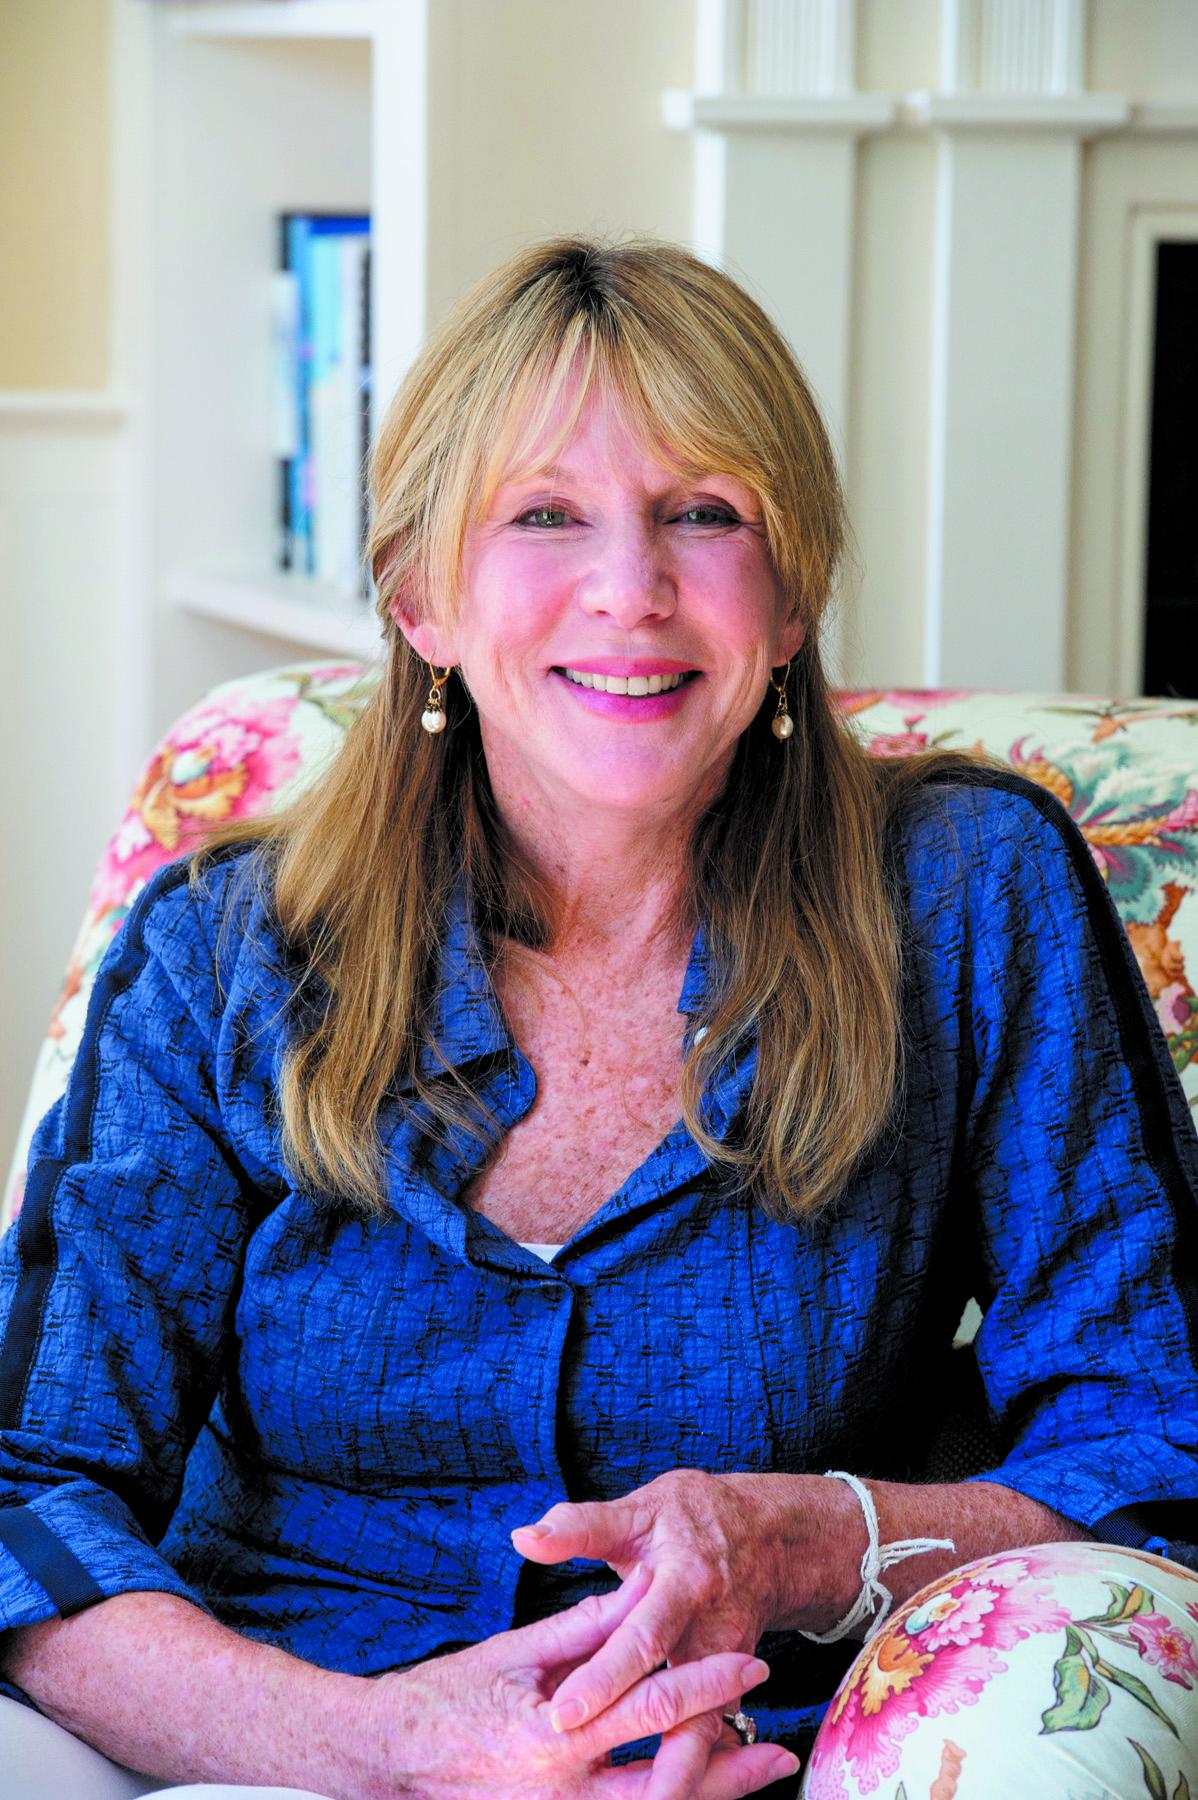 Laurie Heflin